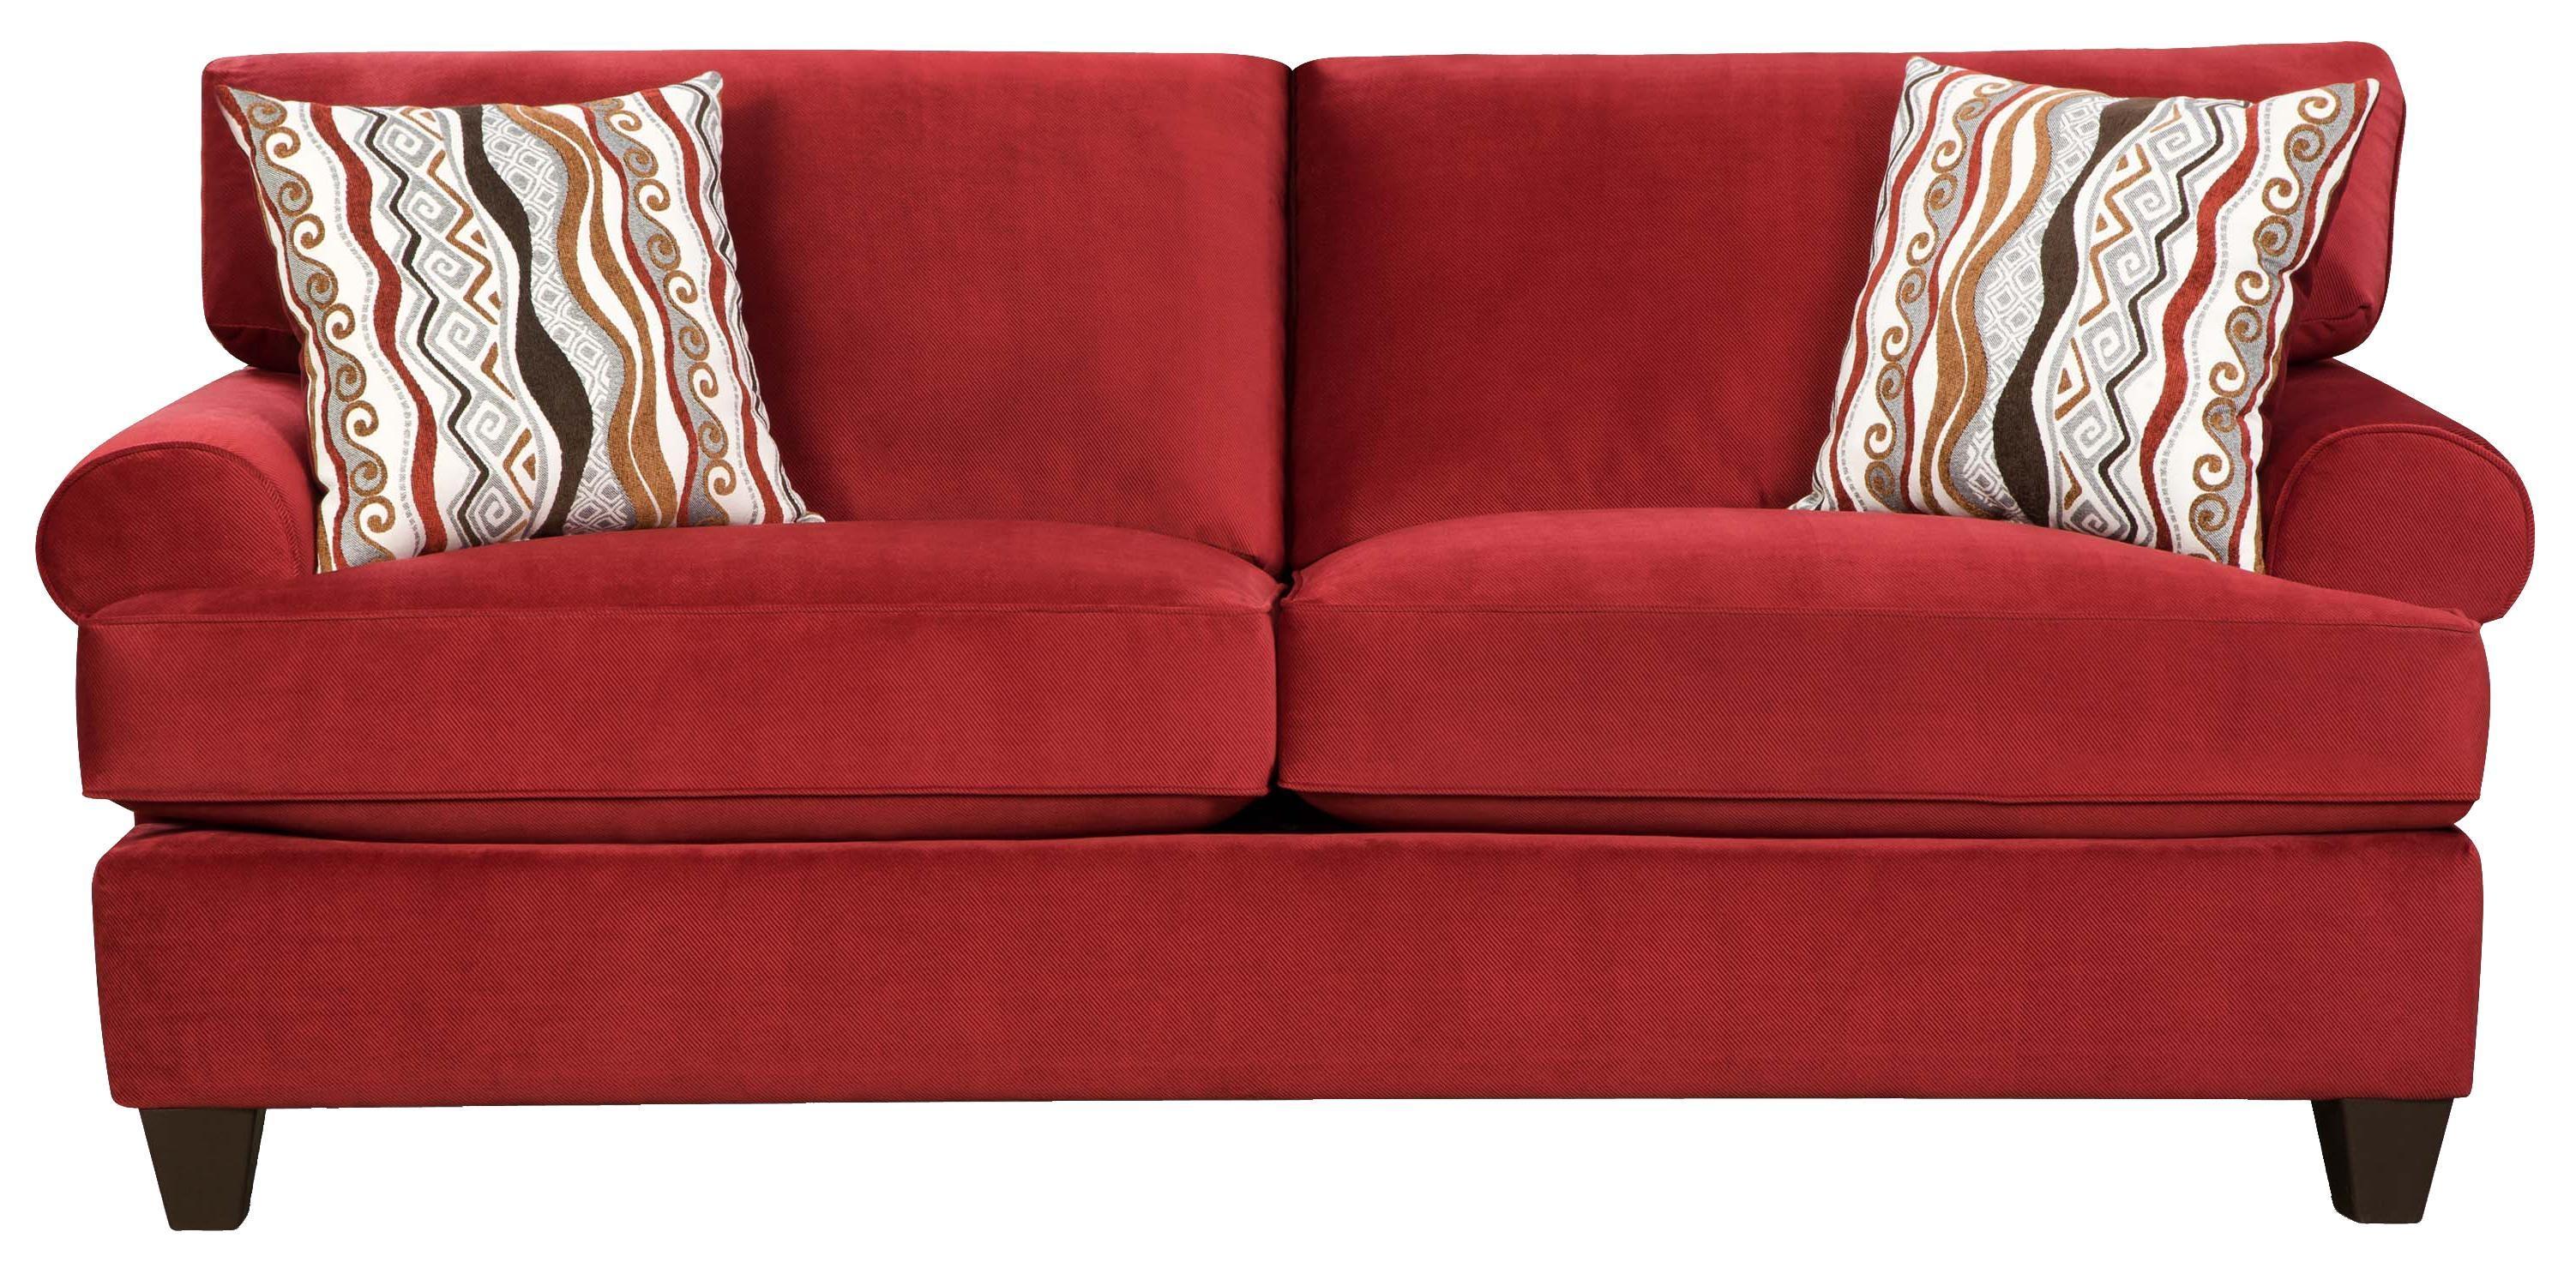 sofa set hd picture ashley furniture grey sectional 20 ideas of corinthian sofas